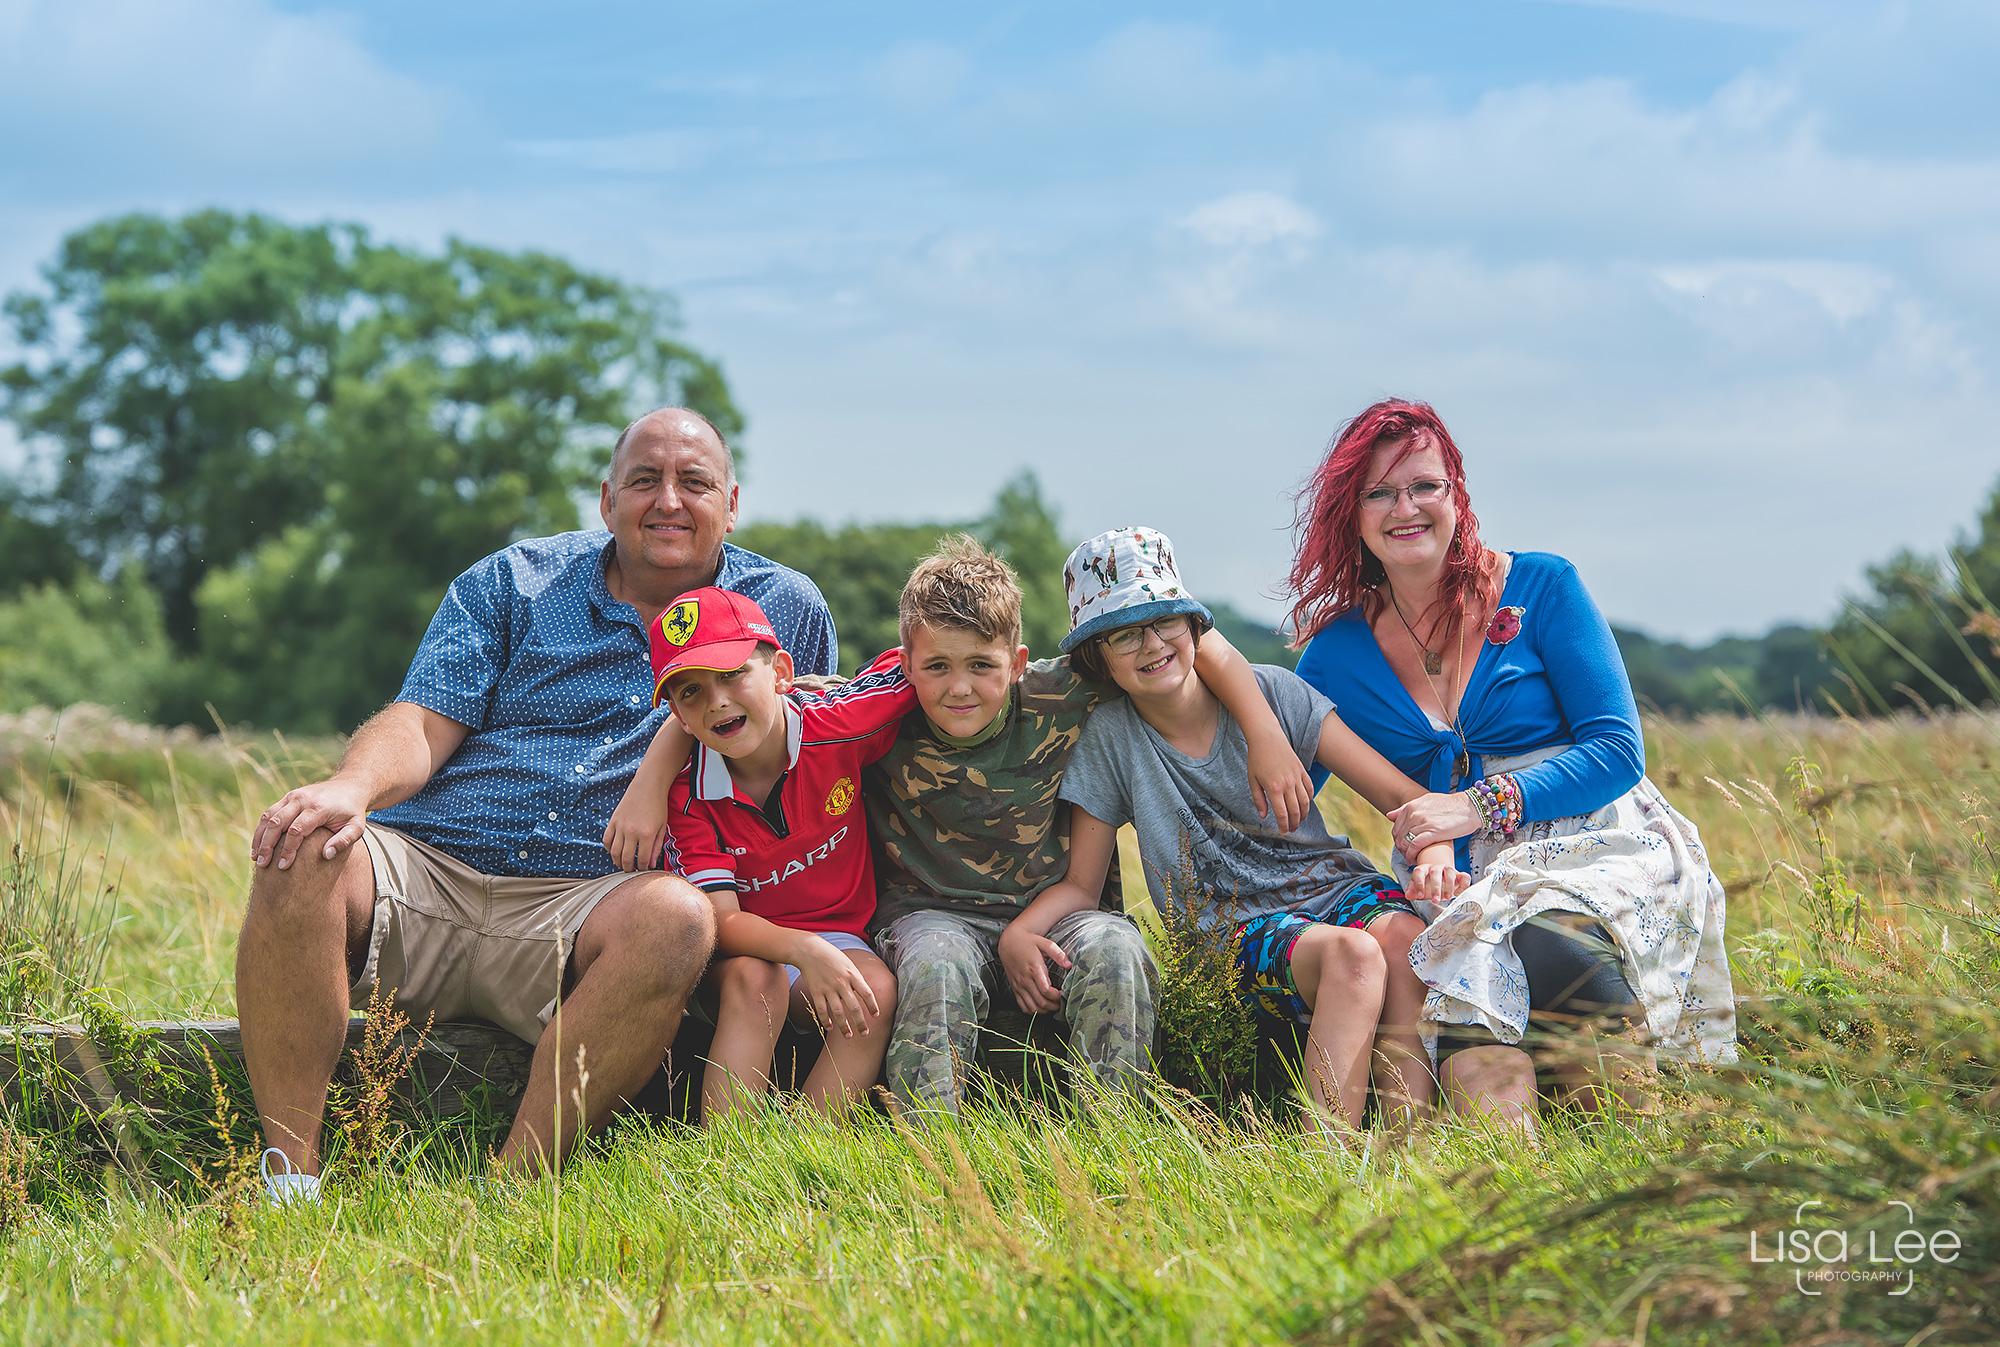 lisa-lee-photography-pateman-family-shoot-countryside-walk-2.jpg